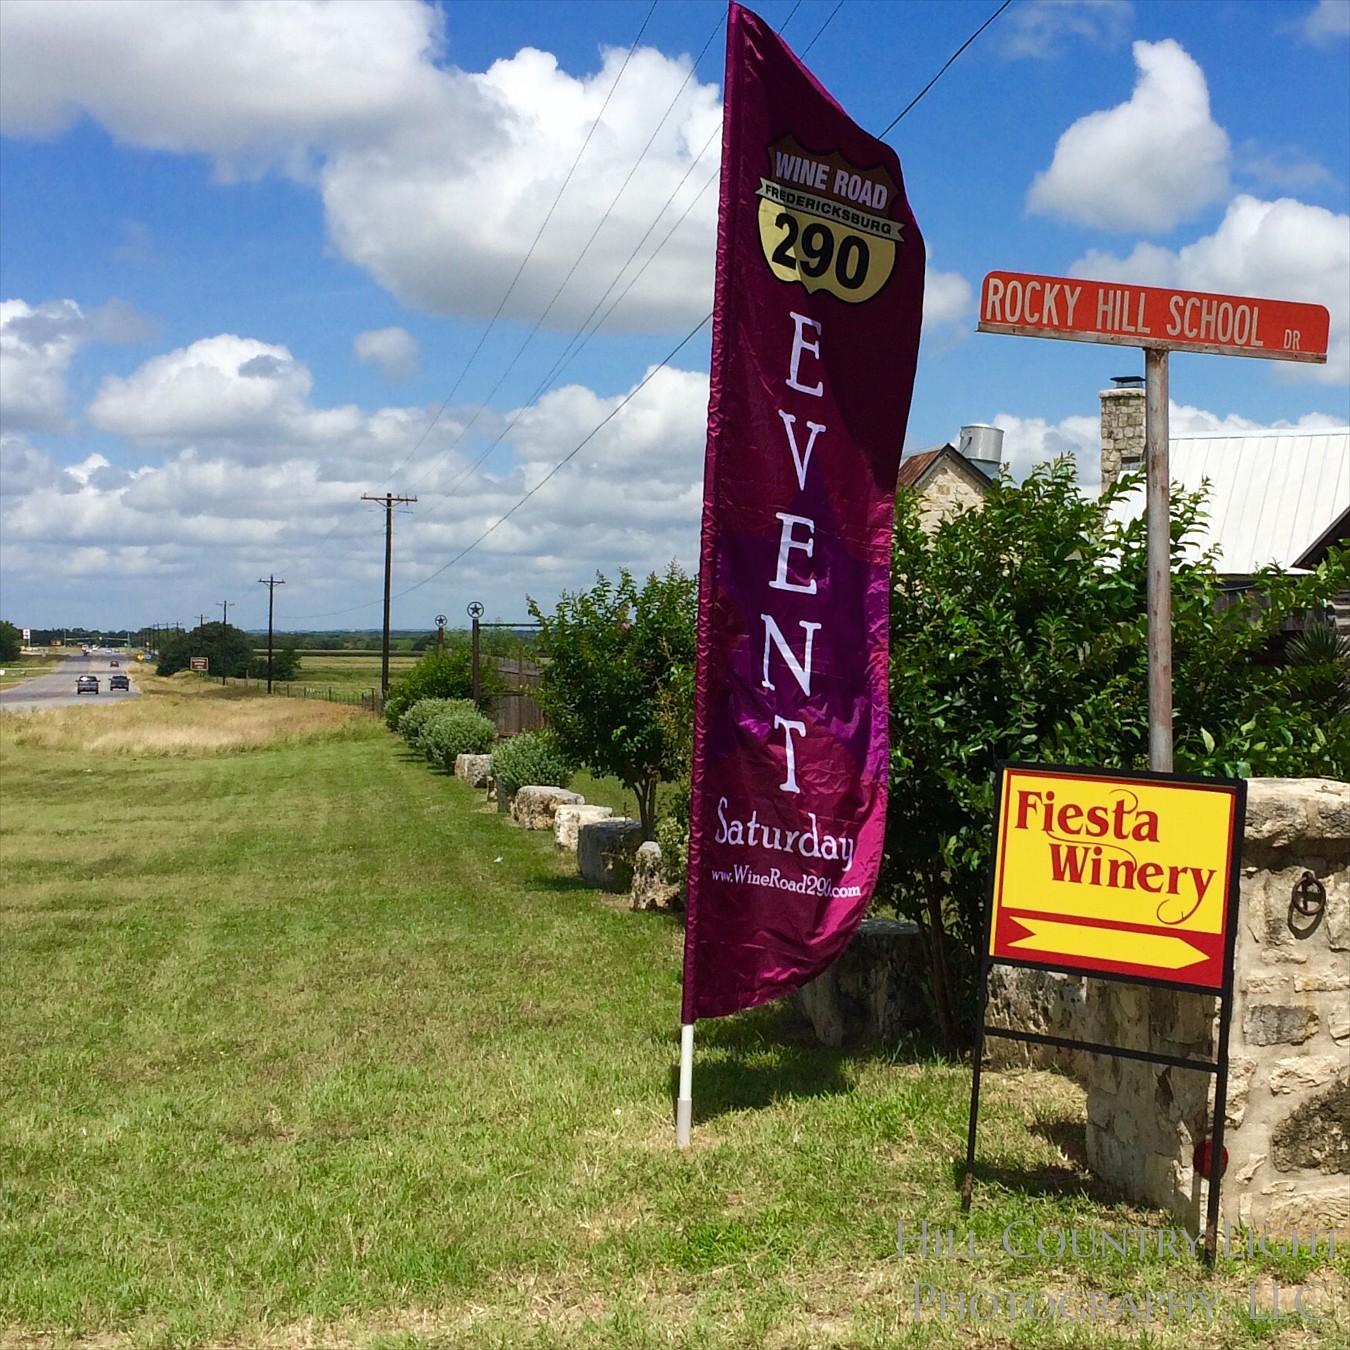 Wine Road 290 event